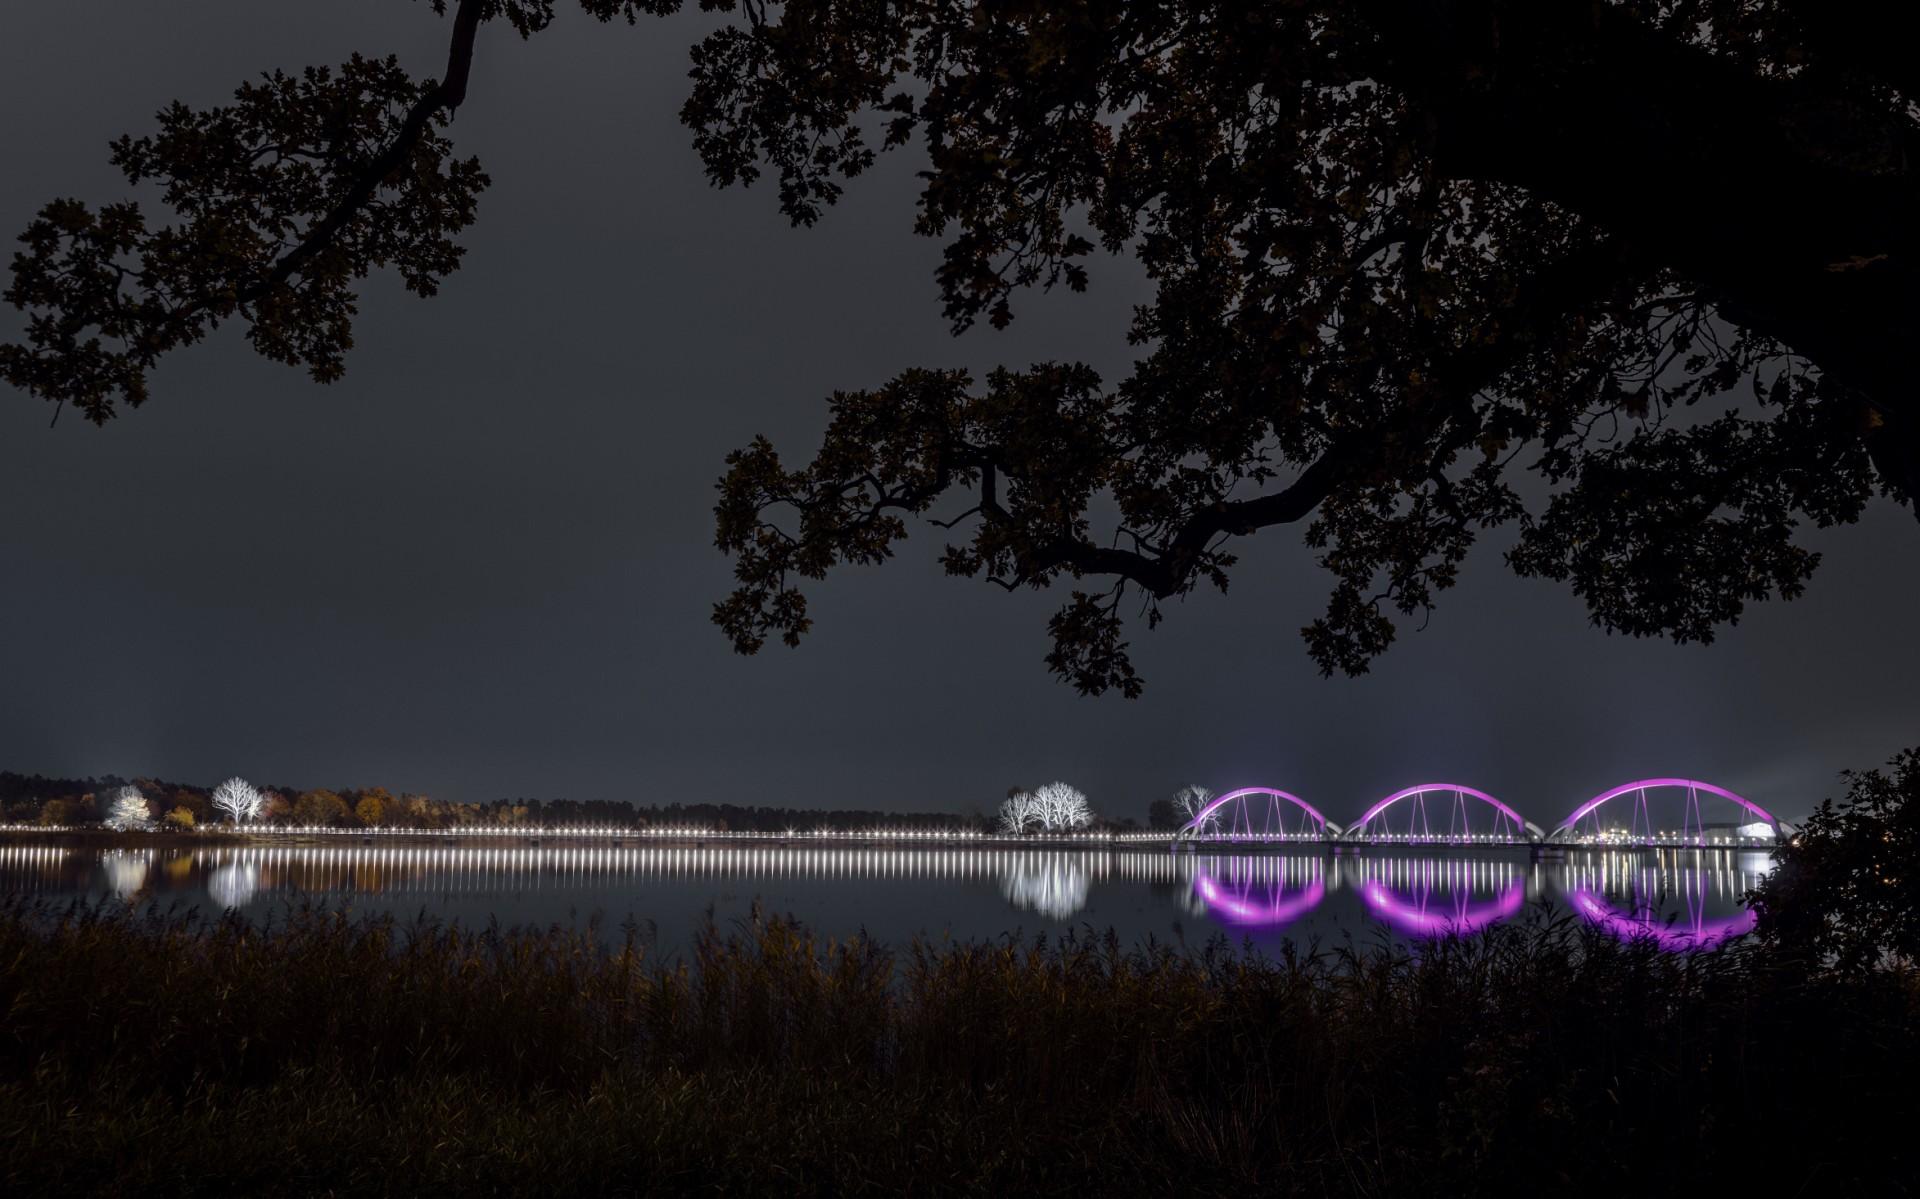 94_635_en_solvesborg_bridge_02